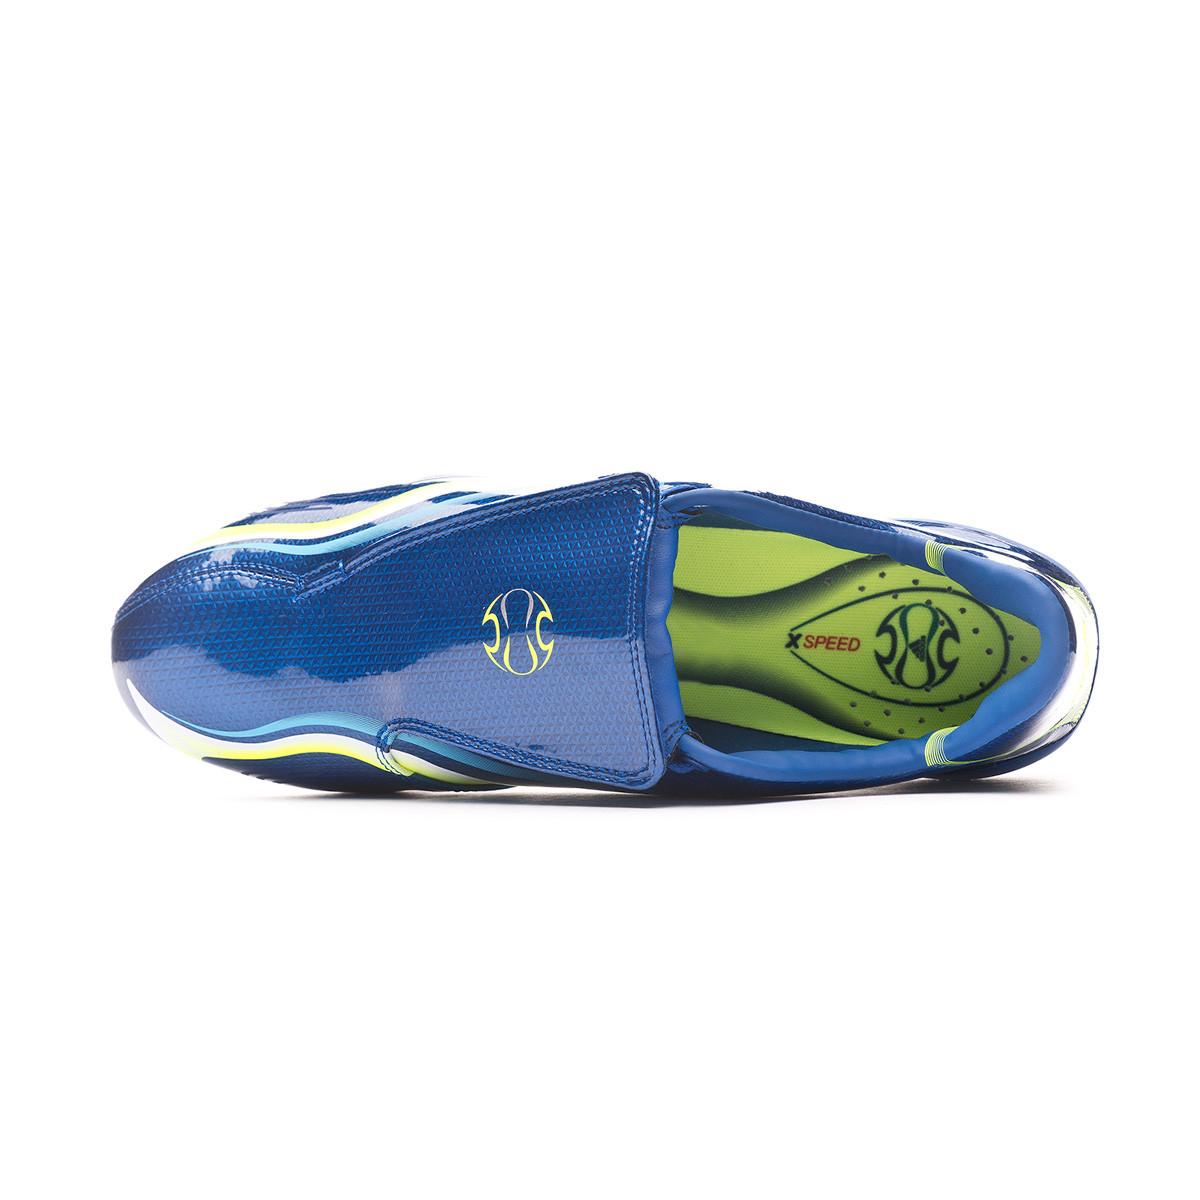 Bota de fútbol adidas X 506+ F50 Tunit Remake Azul Tienda